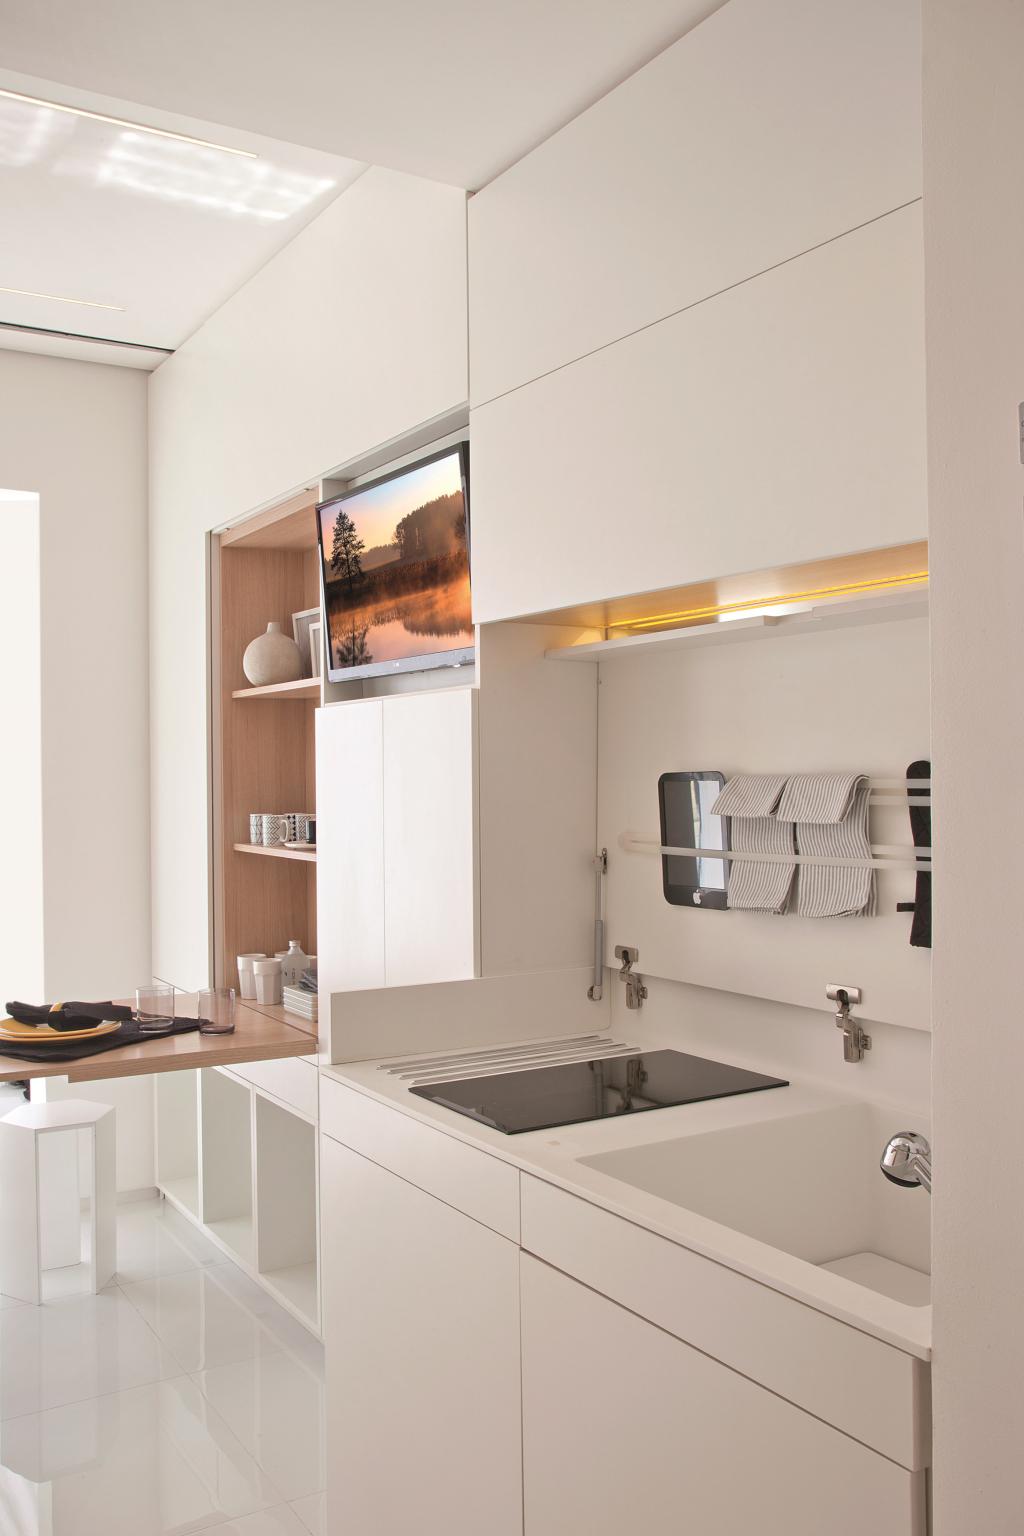 Apê completo em 14 m² | Küche